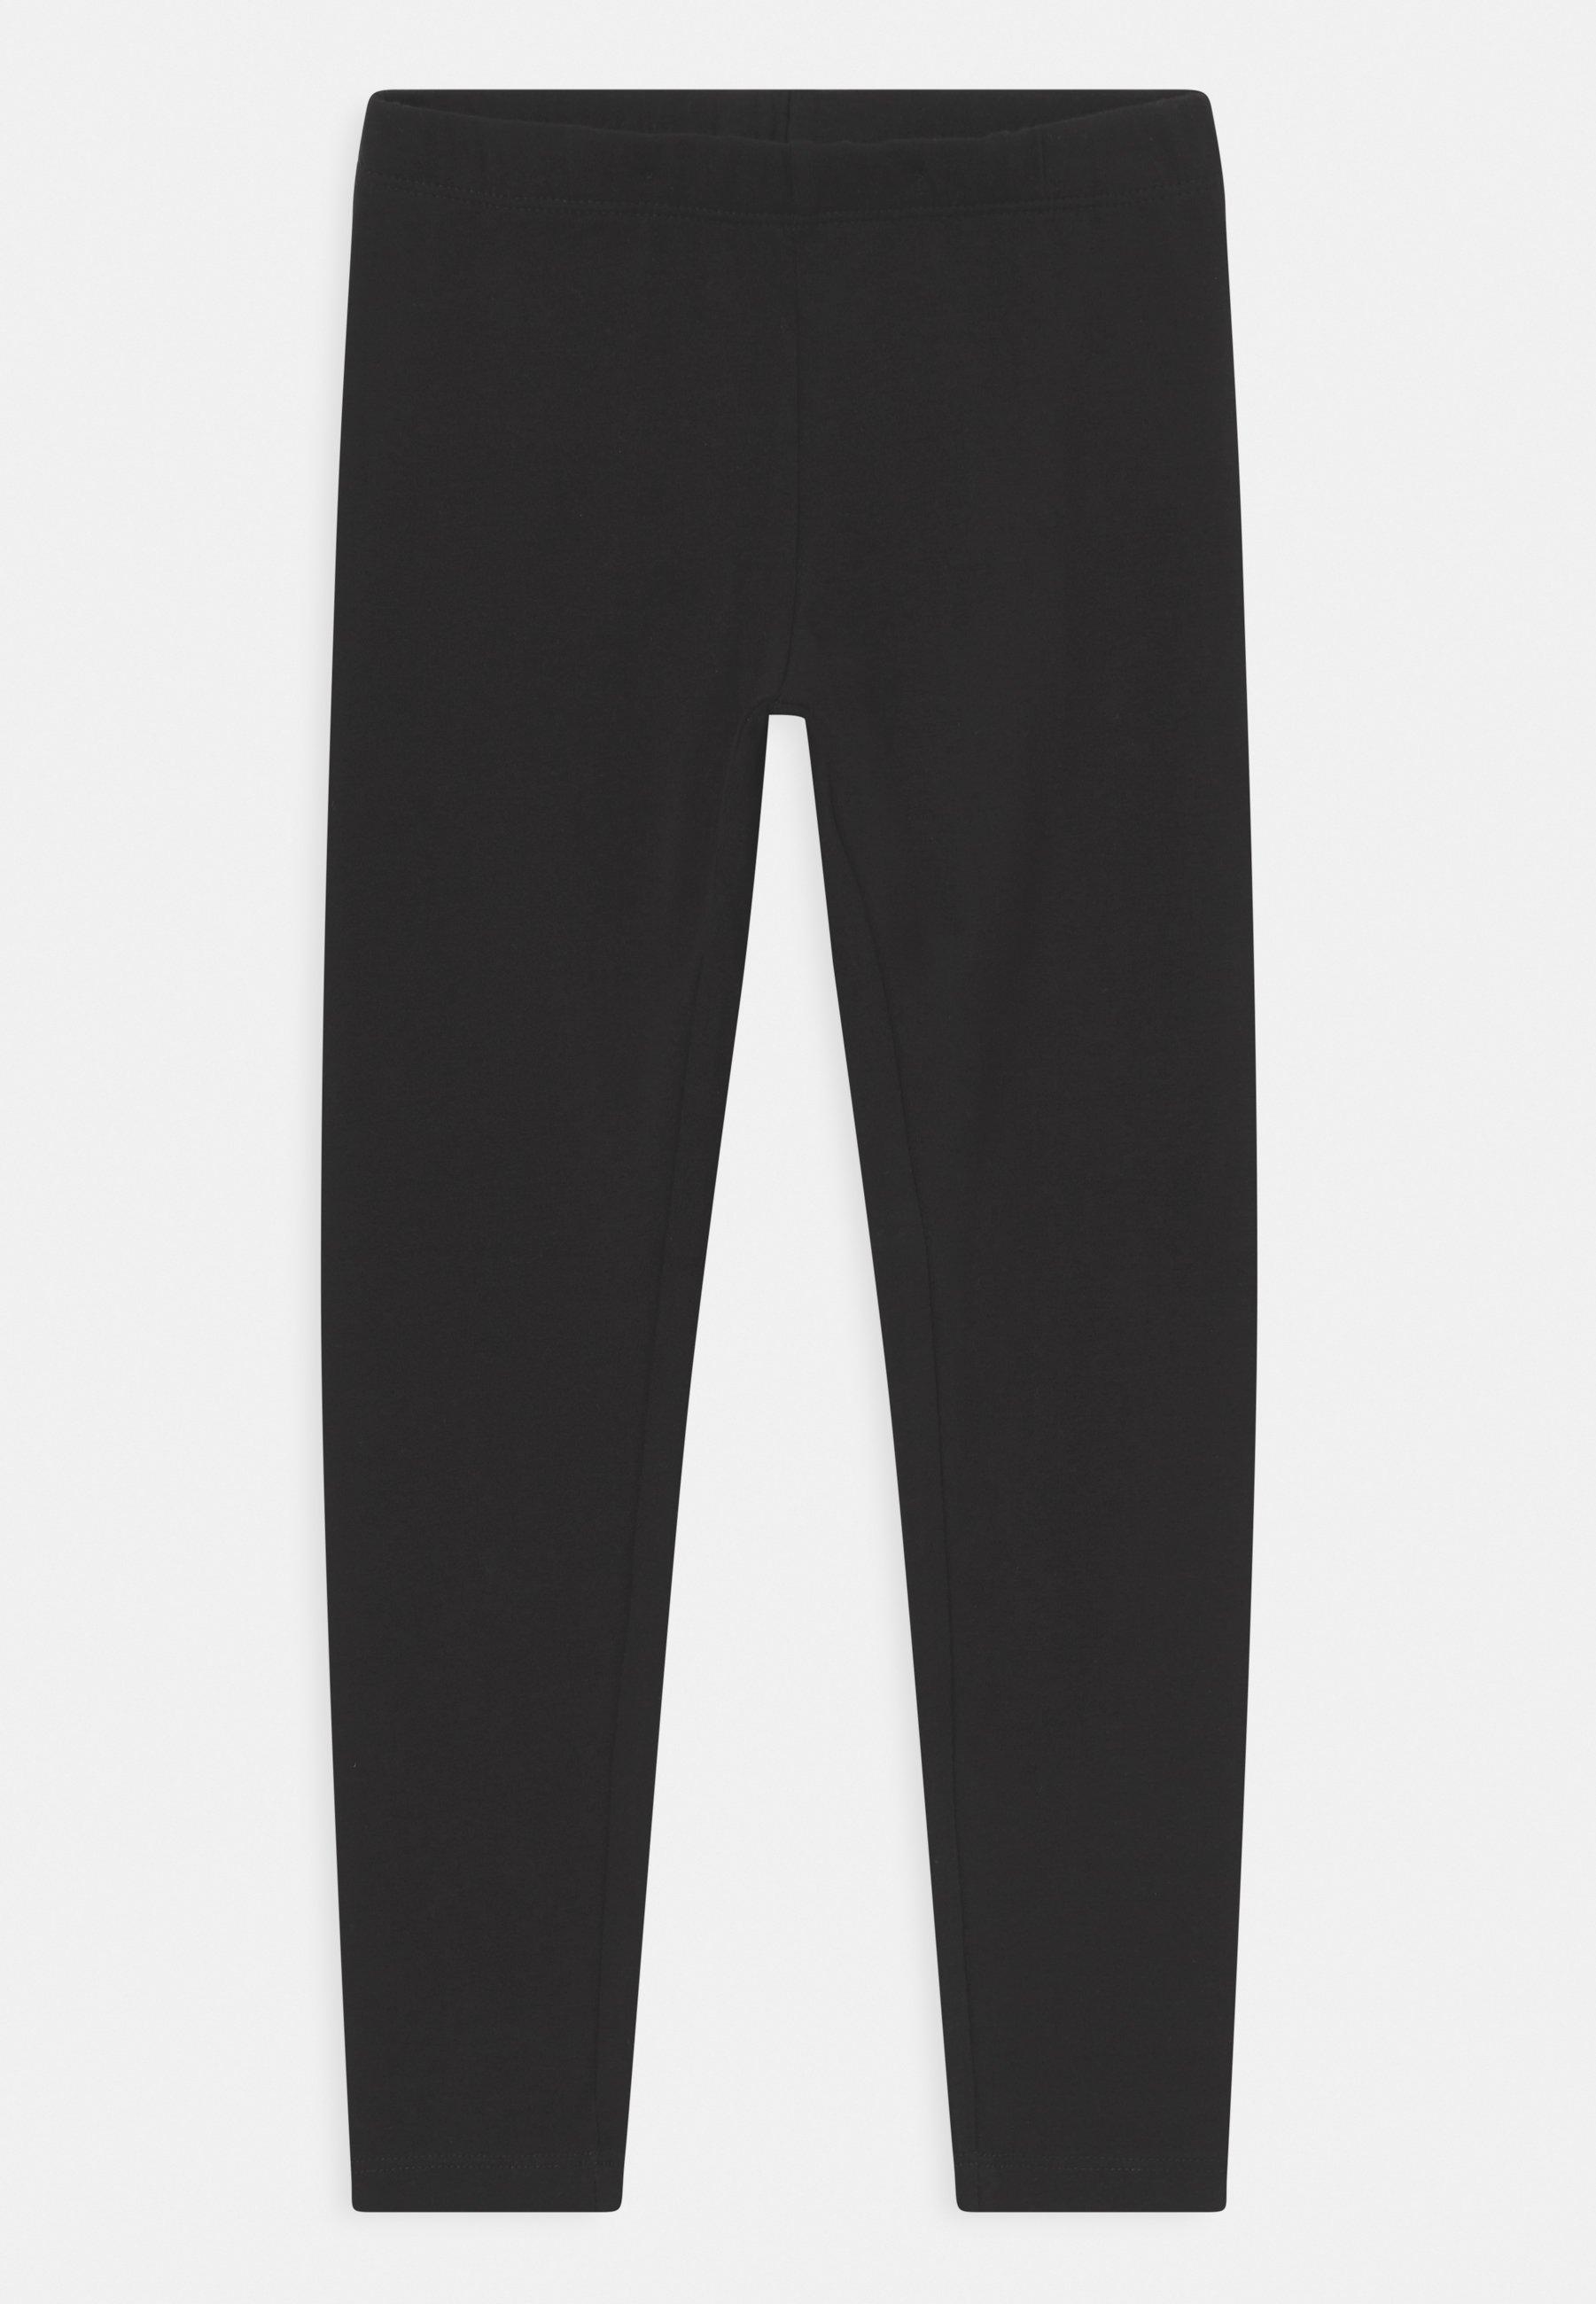 Kids MINI BASIC SOLID - Leggings - Trousers